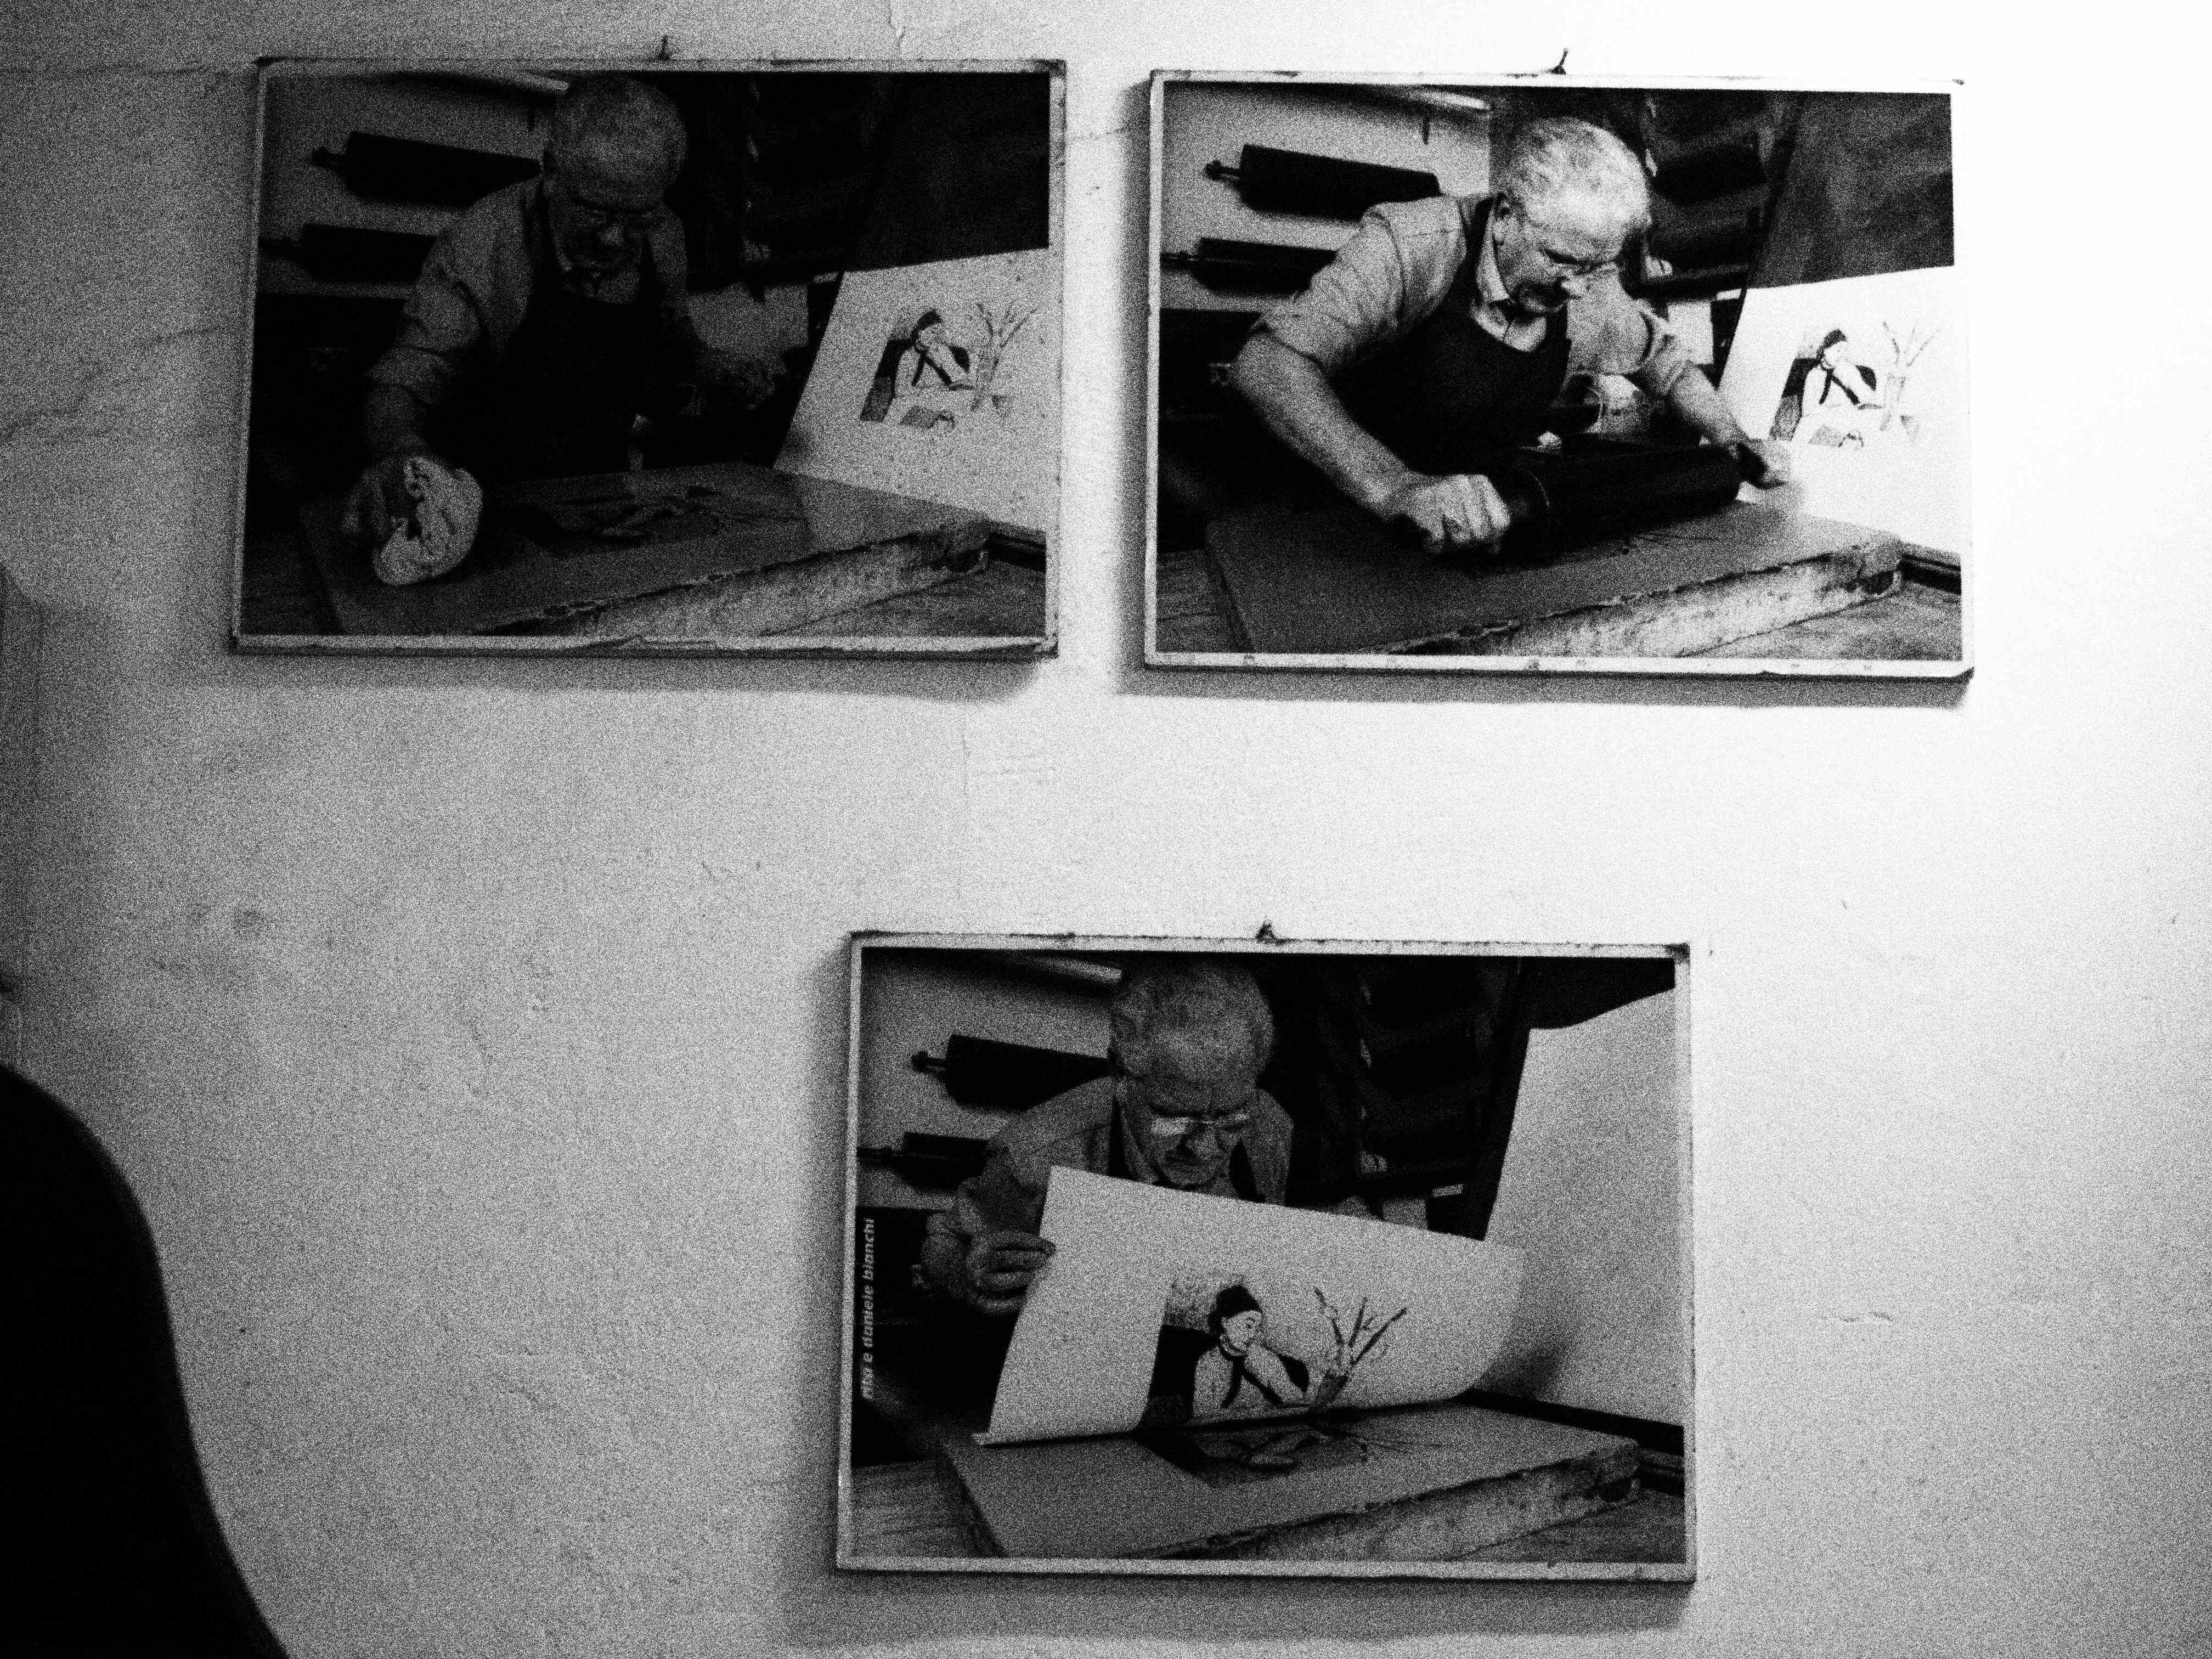 Henry Moore making prints at Il Bisonte